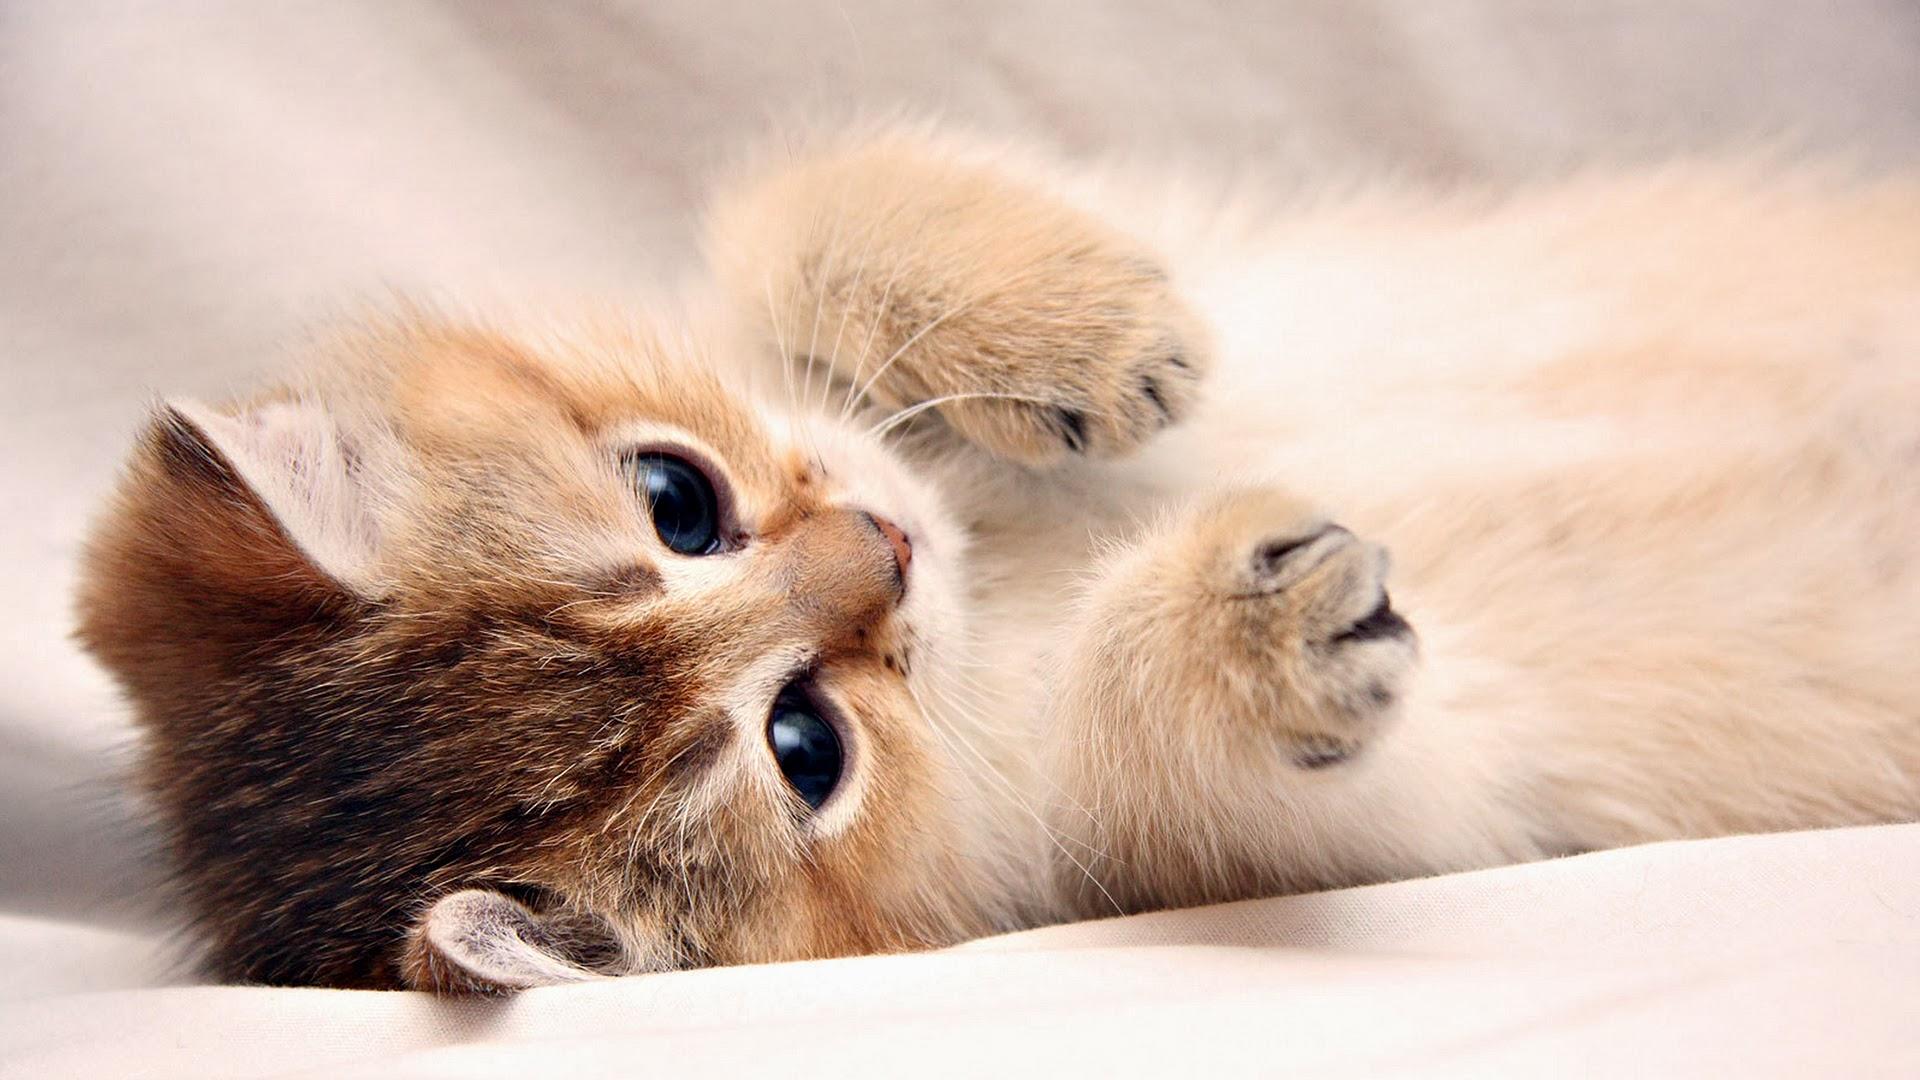 Cute Cat Wallpaper Hd Sf Wallpaper